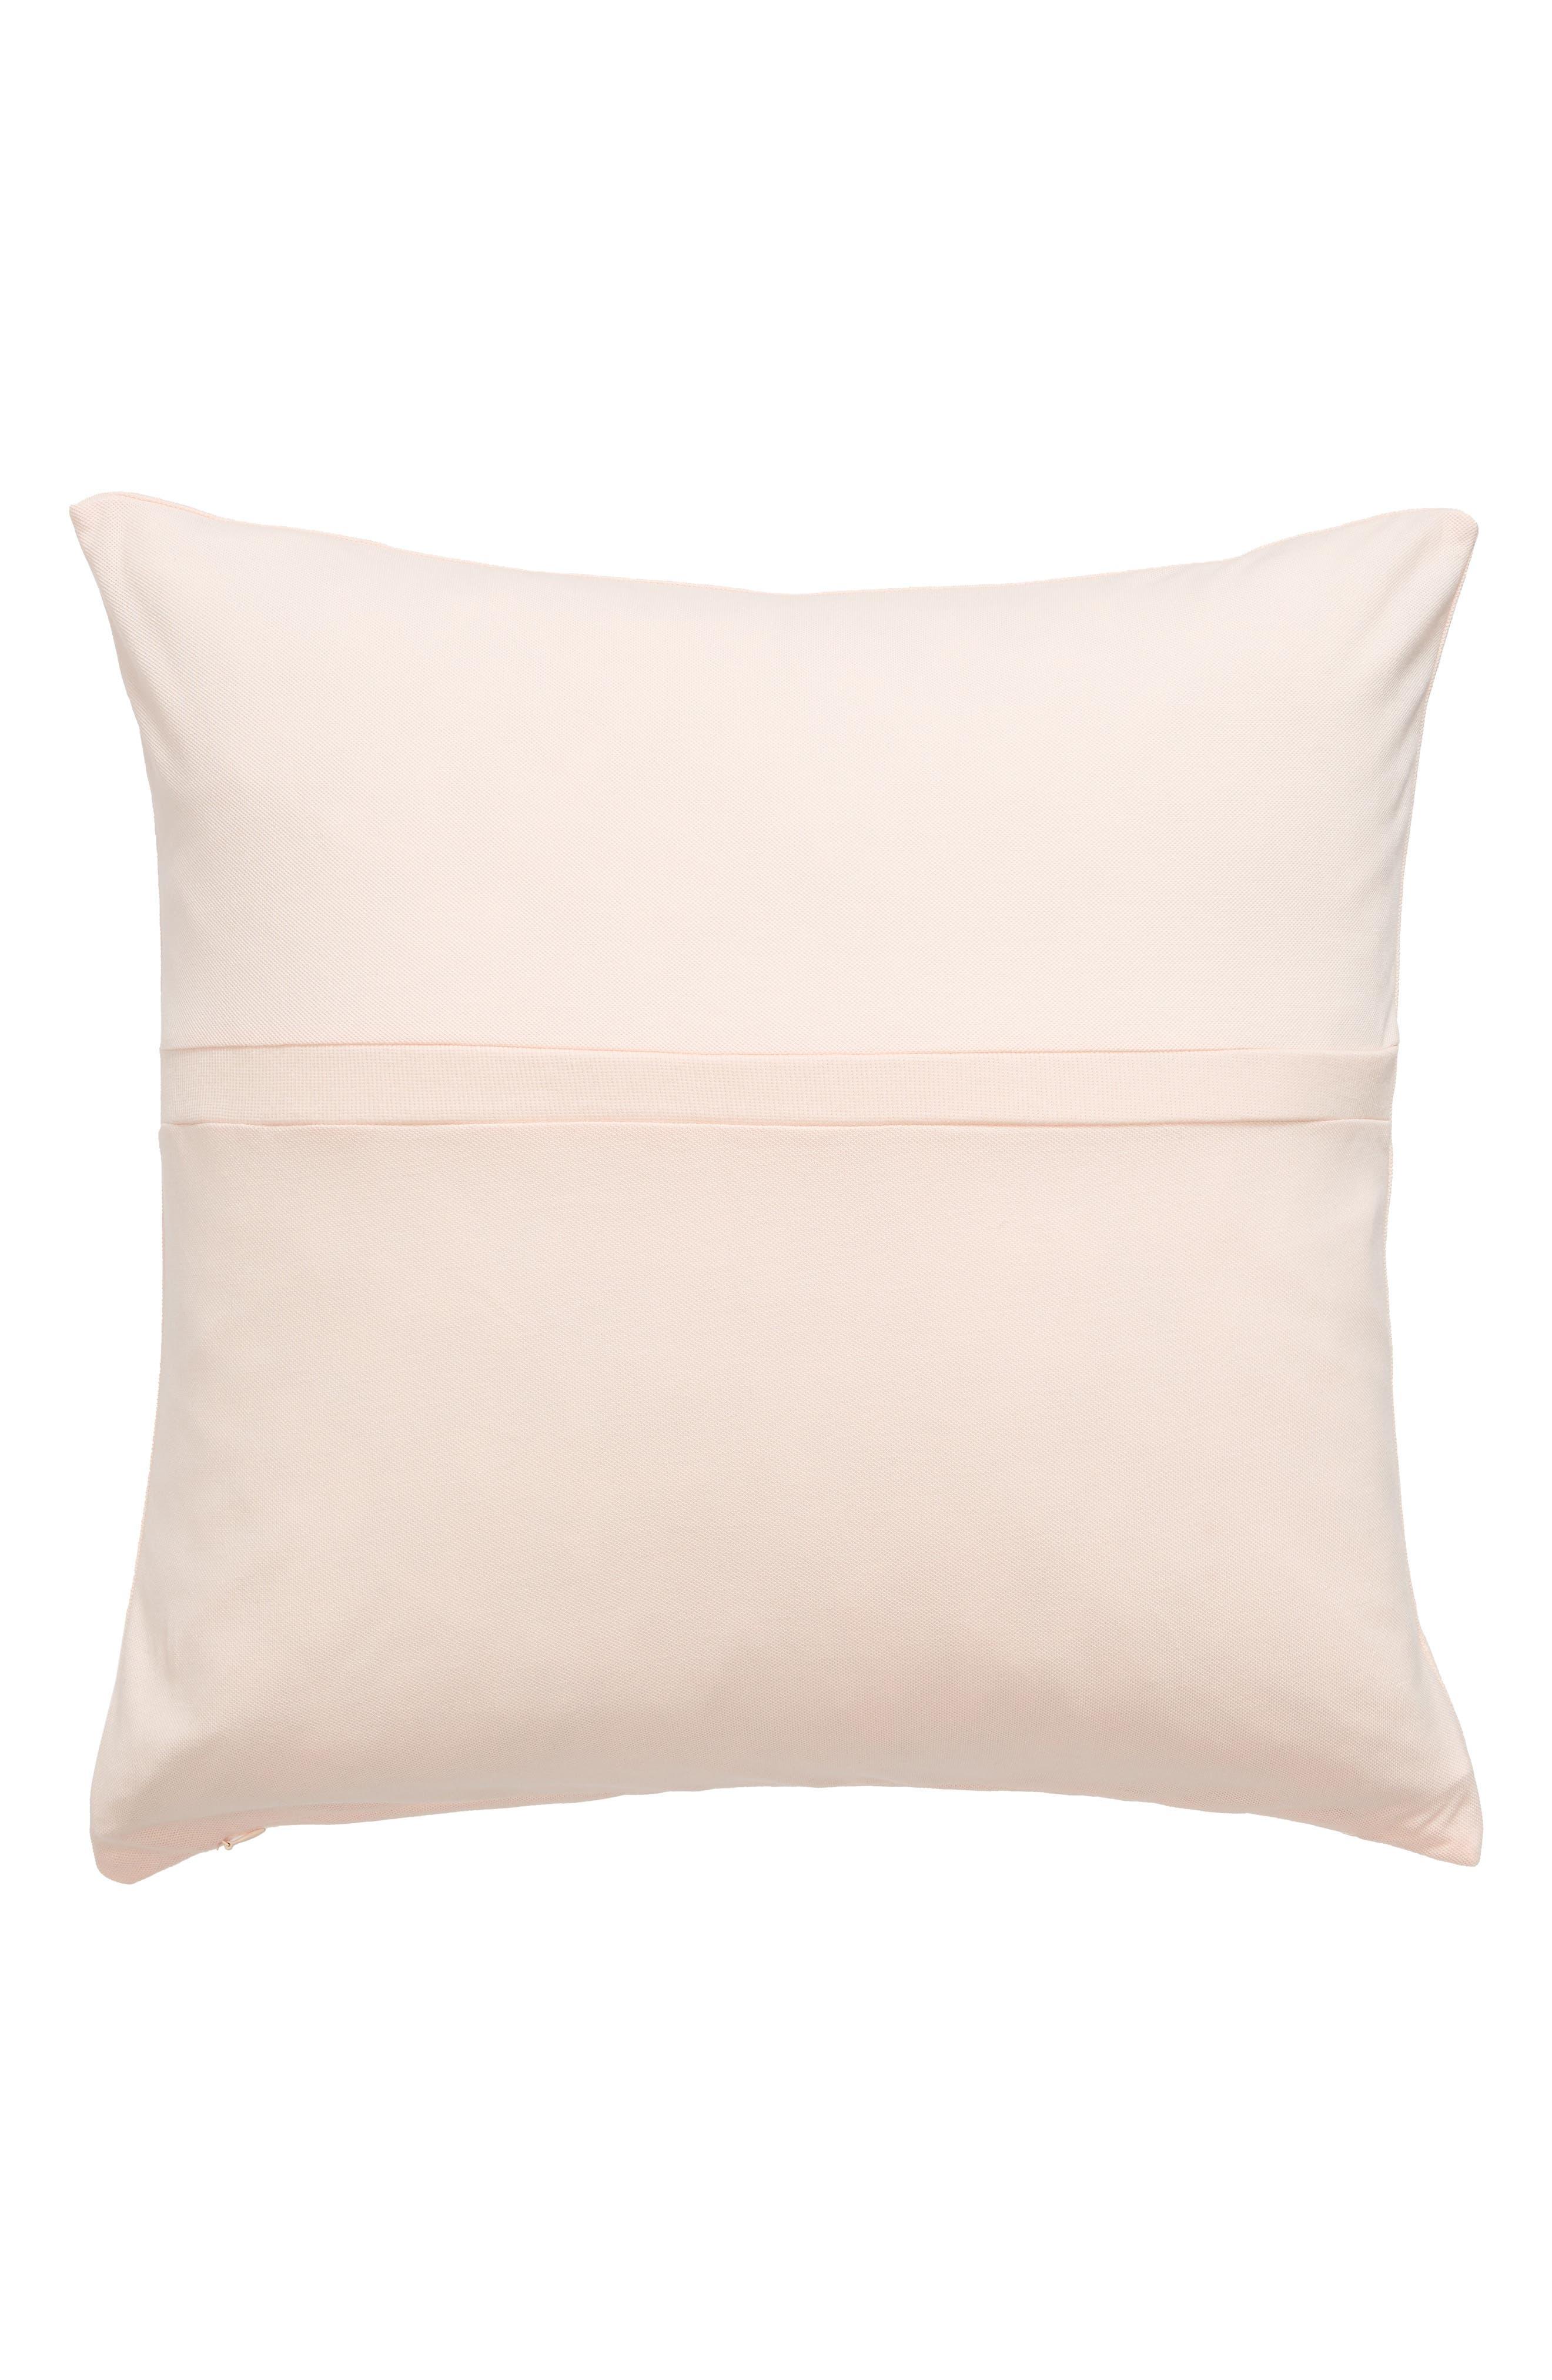 Home Jacob Accent Pillow,                             Alternate thumbnail 2, color,                             650